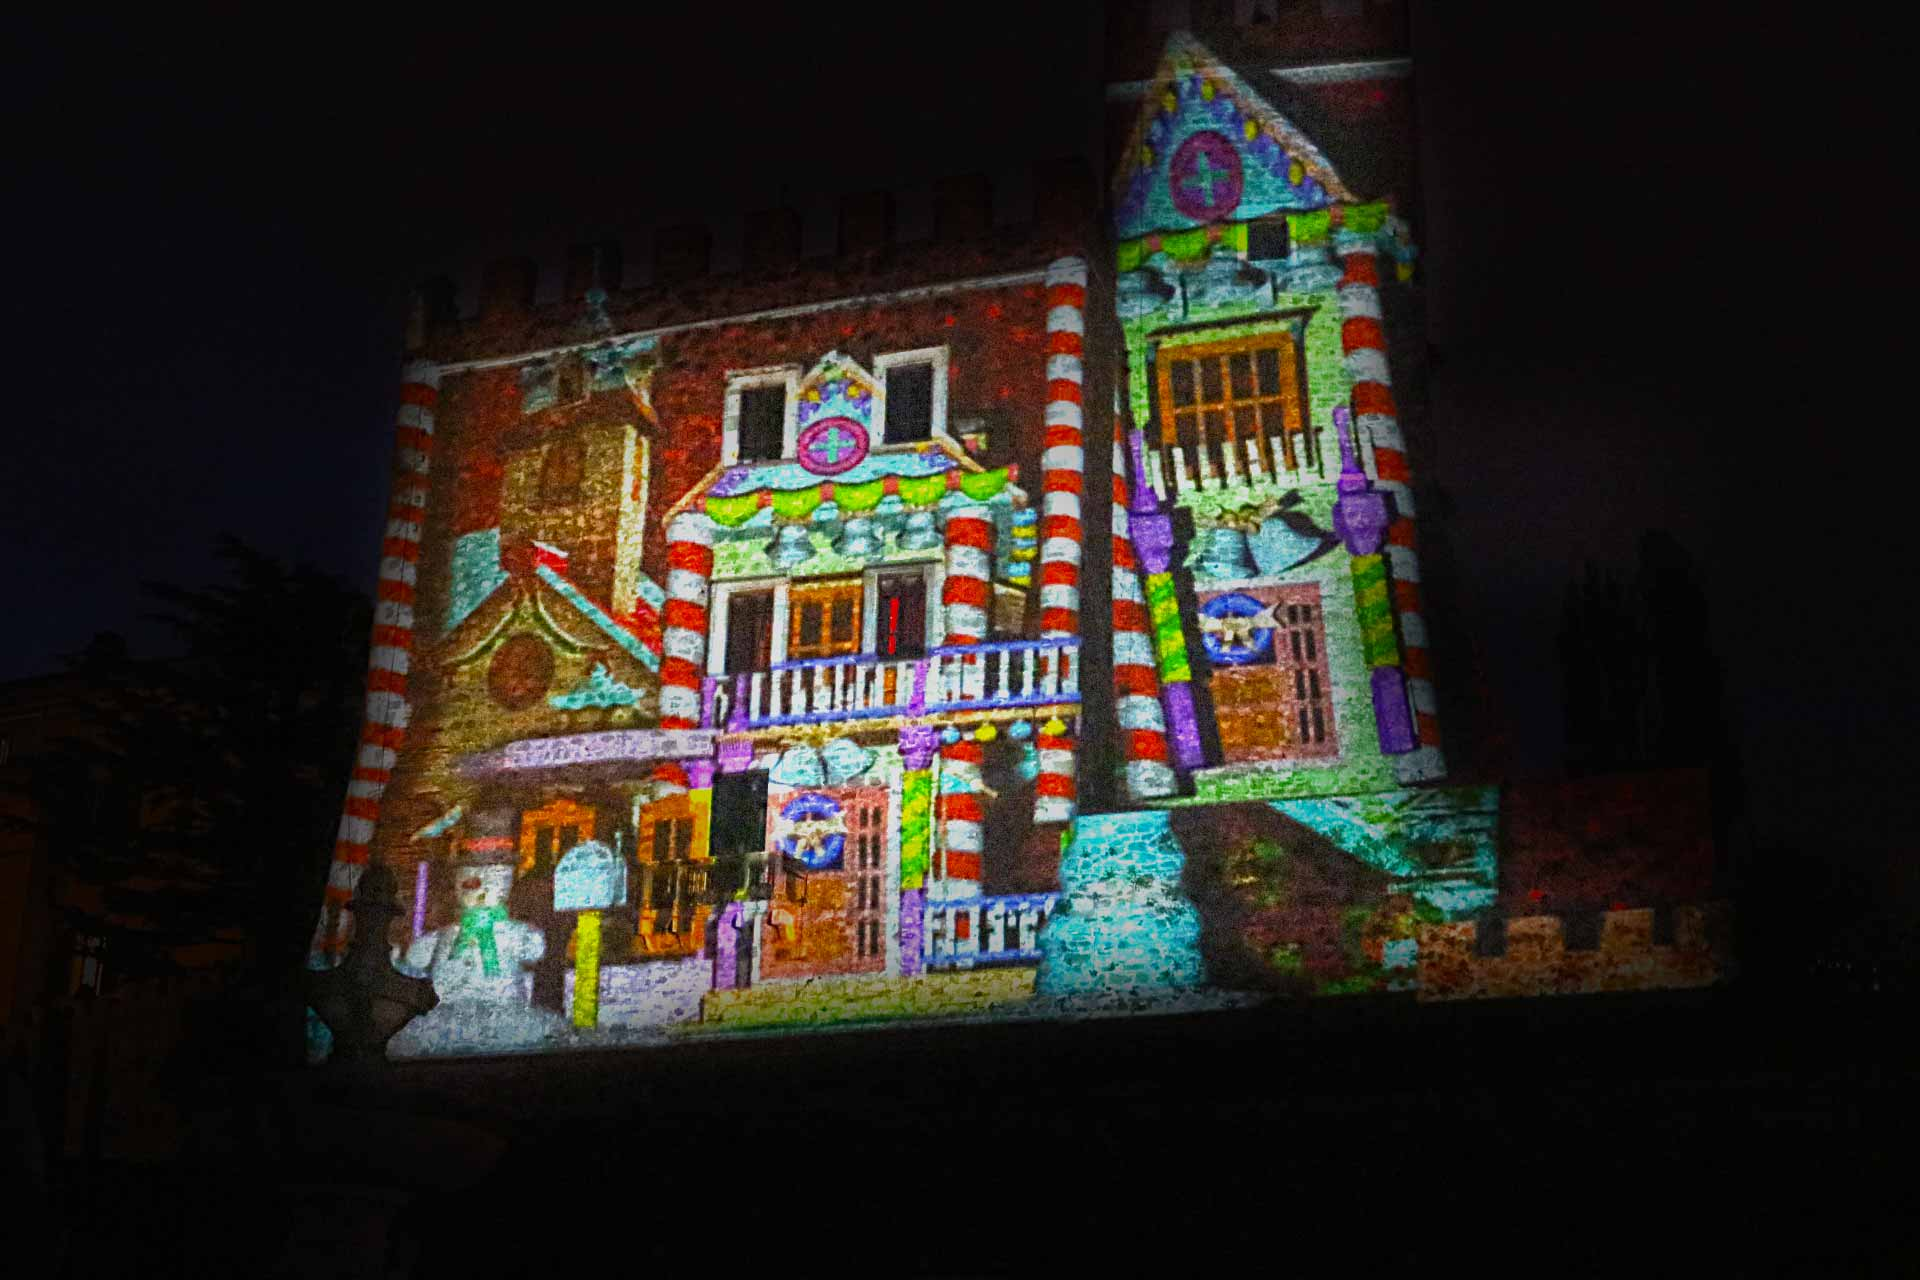 3d Hologram Effect Wallpaper Christmas 3d Video Mapping Manciano Gr 3d Video